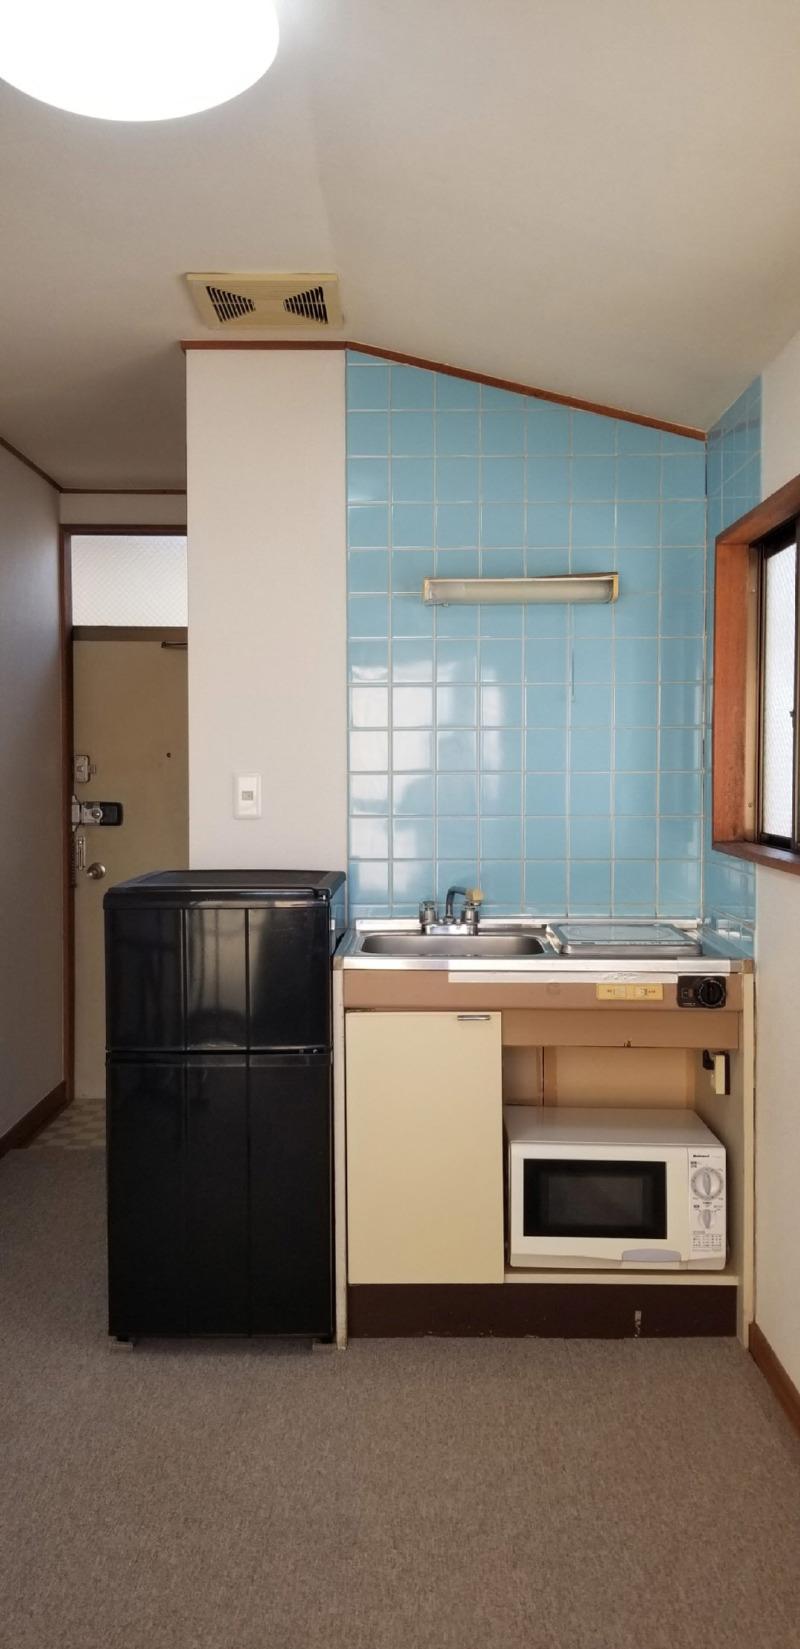 S206 キッチン&入り口.jpg